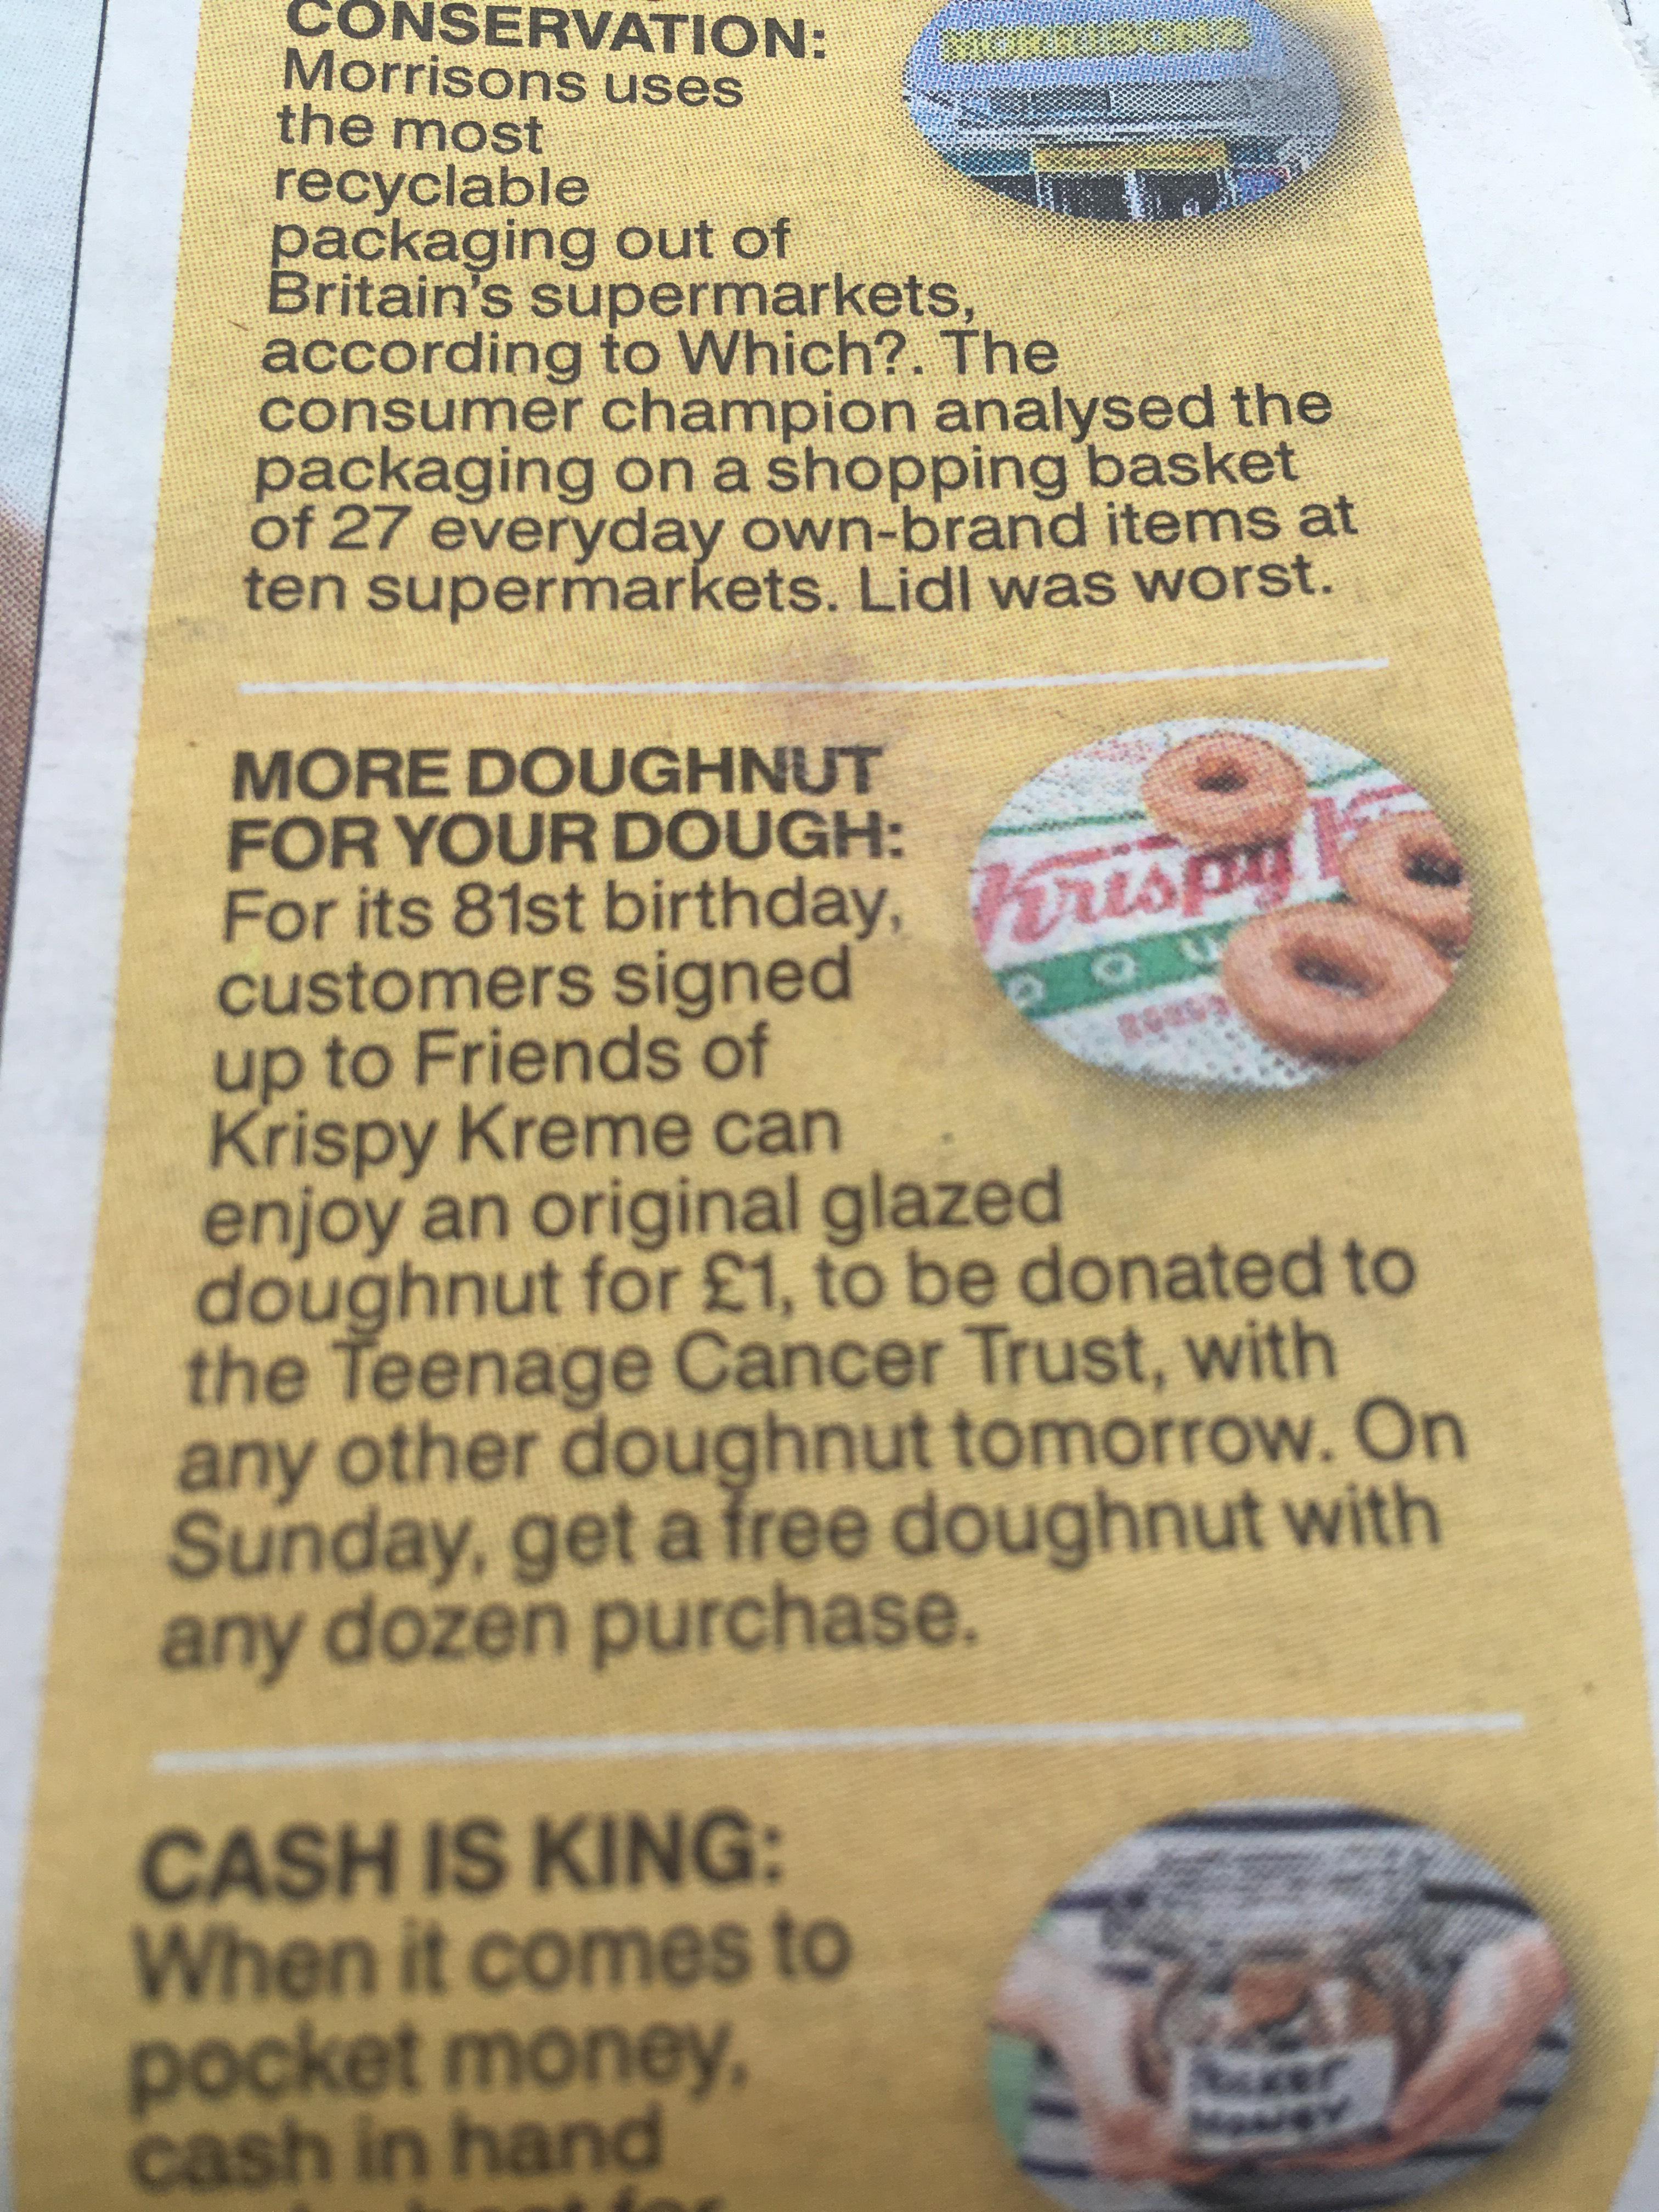 Krispy Kreme 81st birthday deals if signed up to loyalty scheme